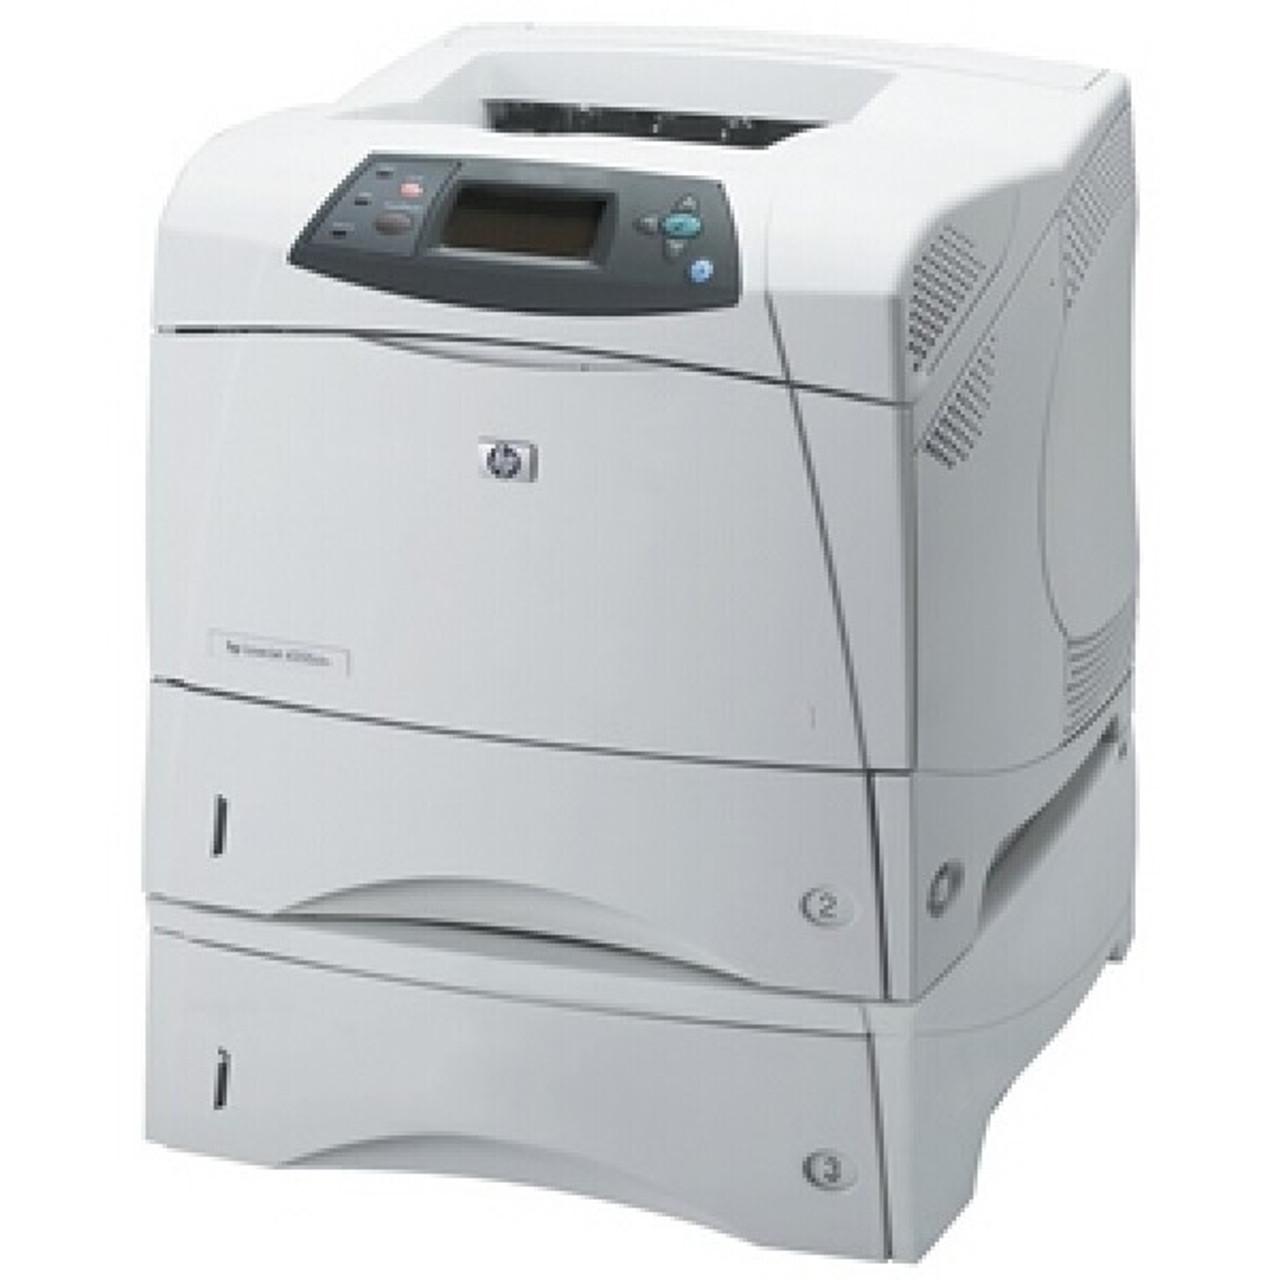 HP LaserJet 4300TN - Q2433A -HP Laser Printer for sale